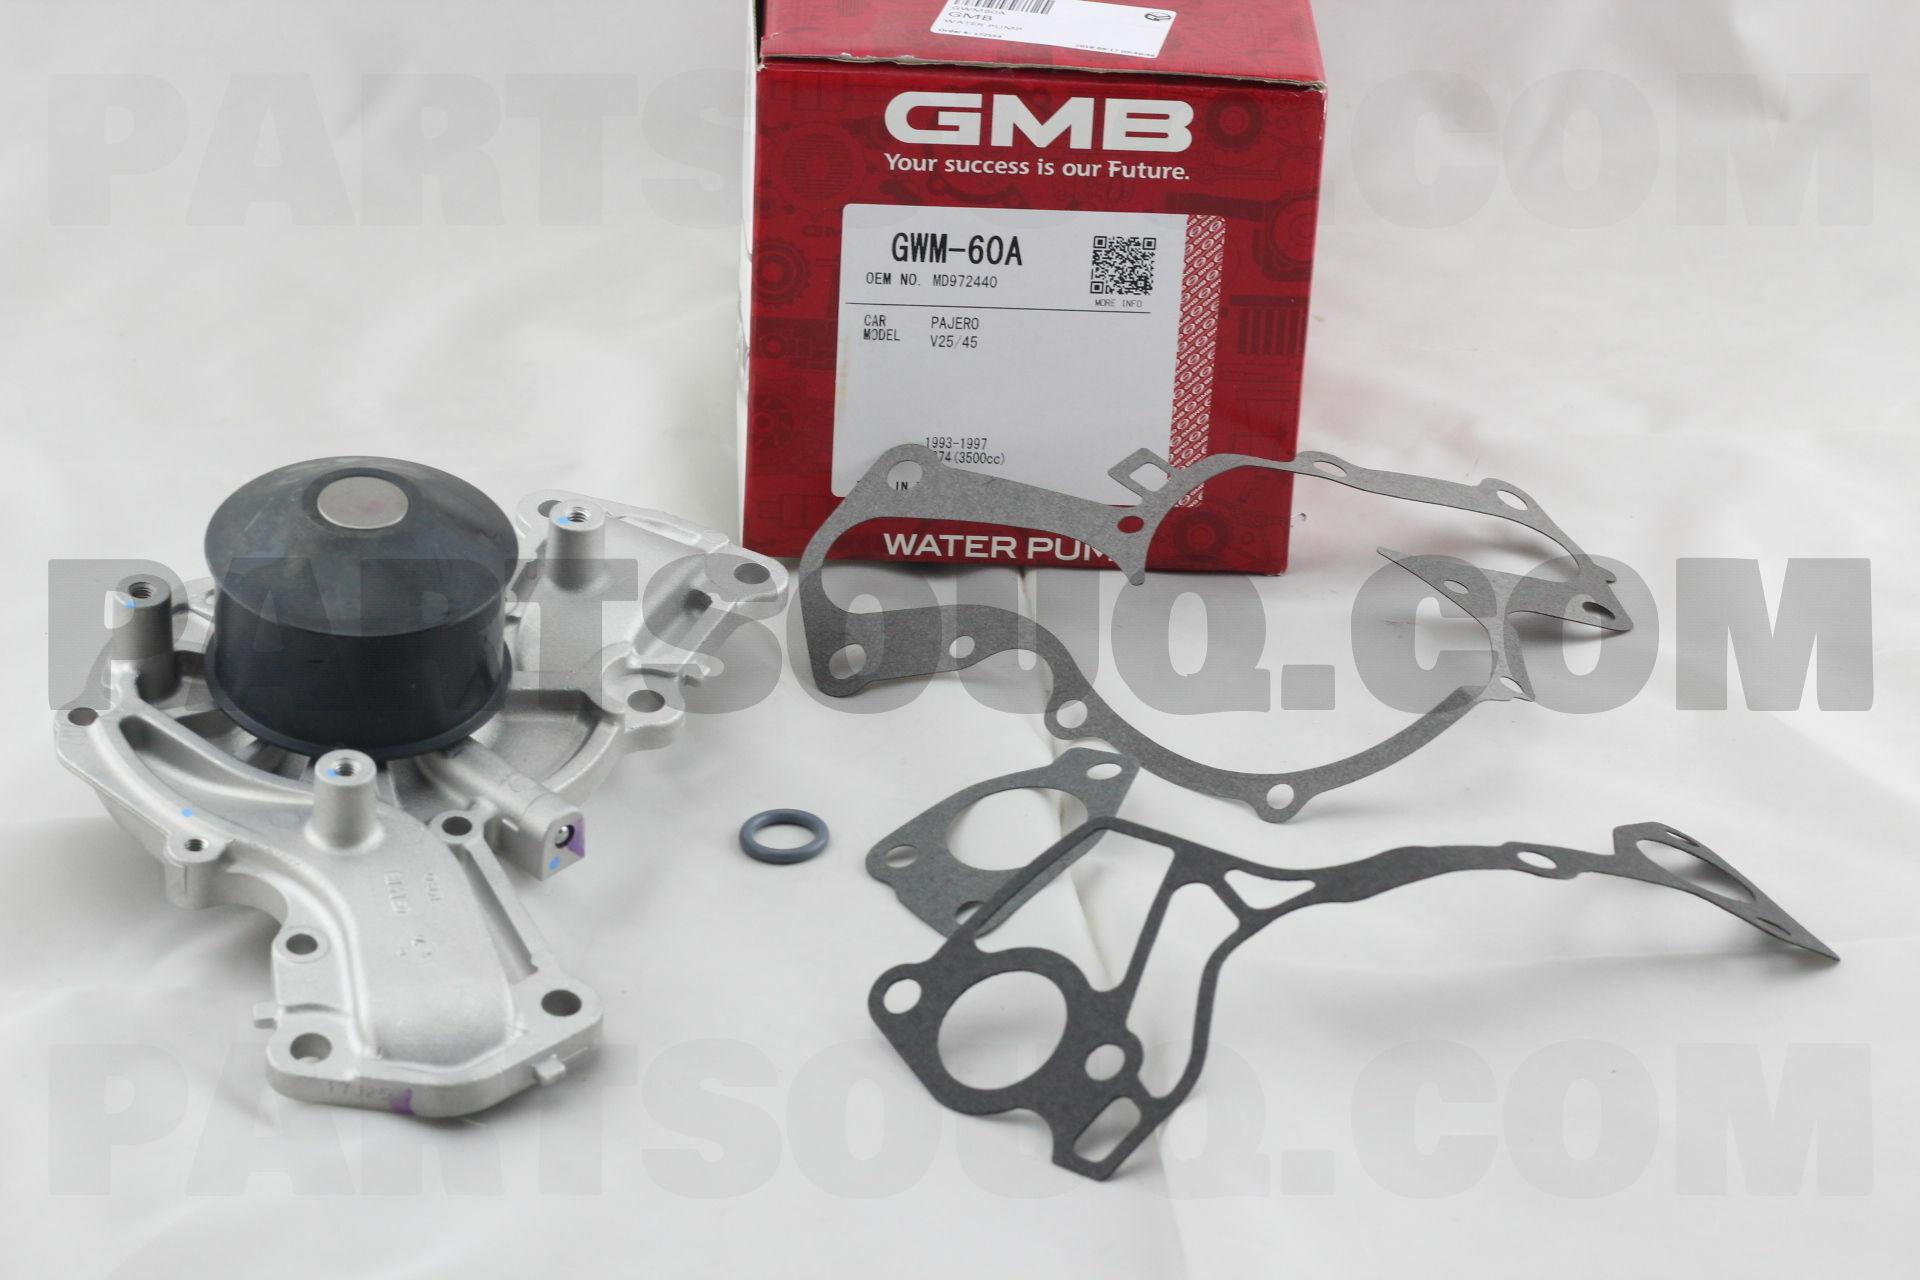 GMB GWM-60A Water Pump